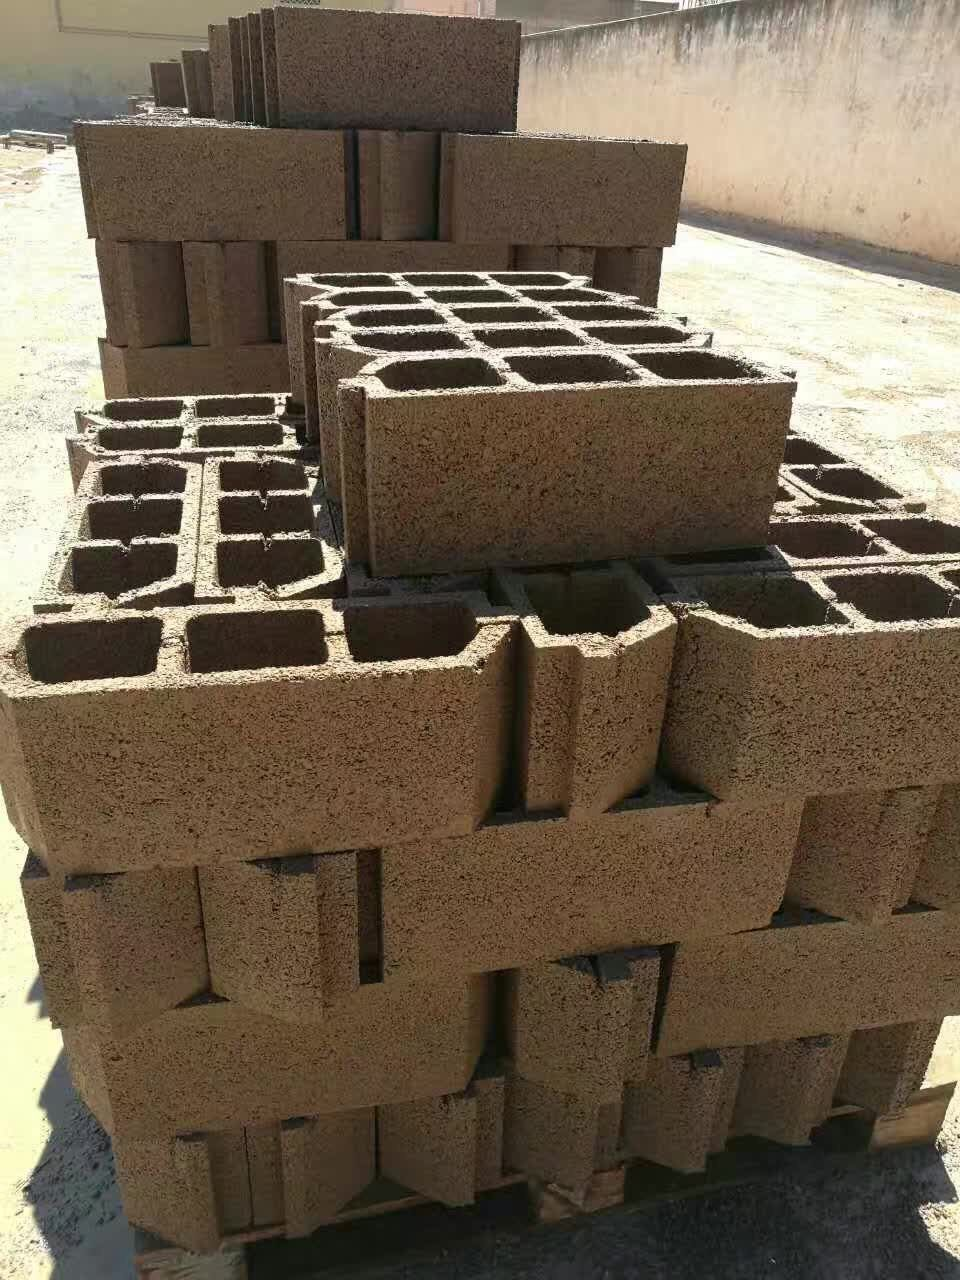 Concrete Hollow Pot Slab Block Machine From Kenya Ghana Tanzania Interlocking Concrete Blocks Interlocking Bricks Concrete Blocks